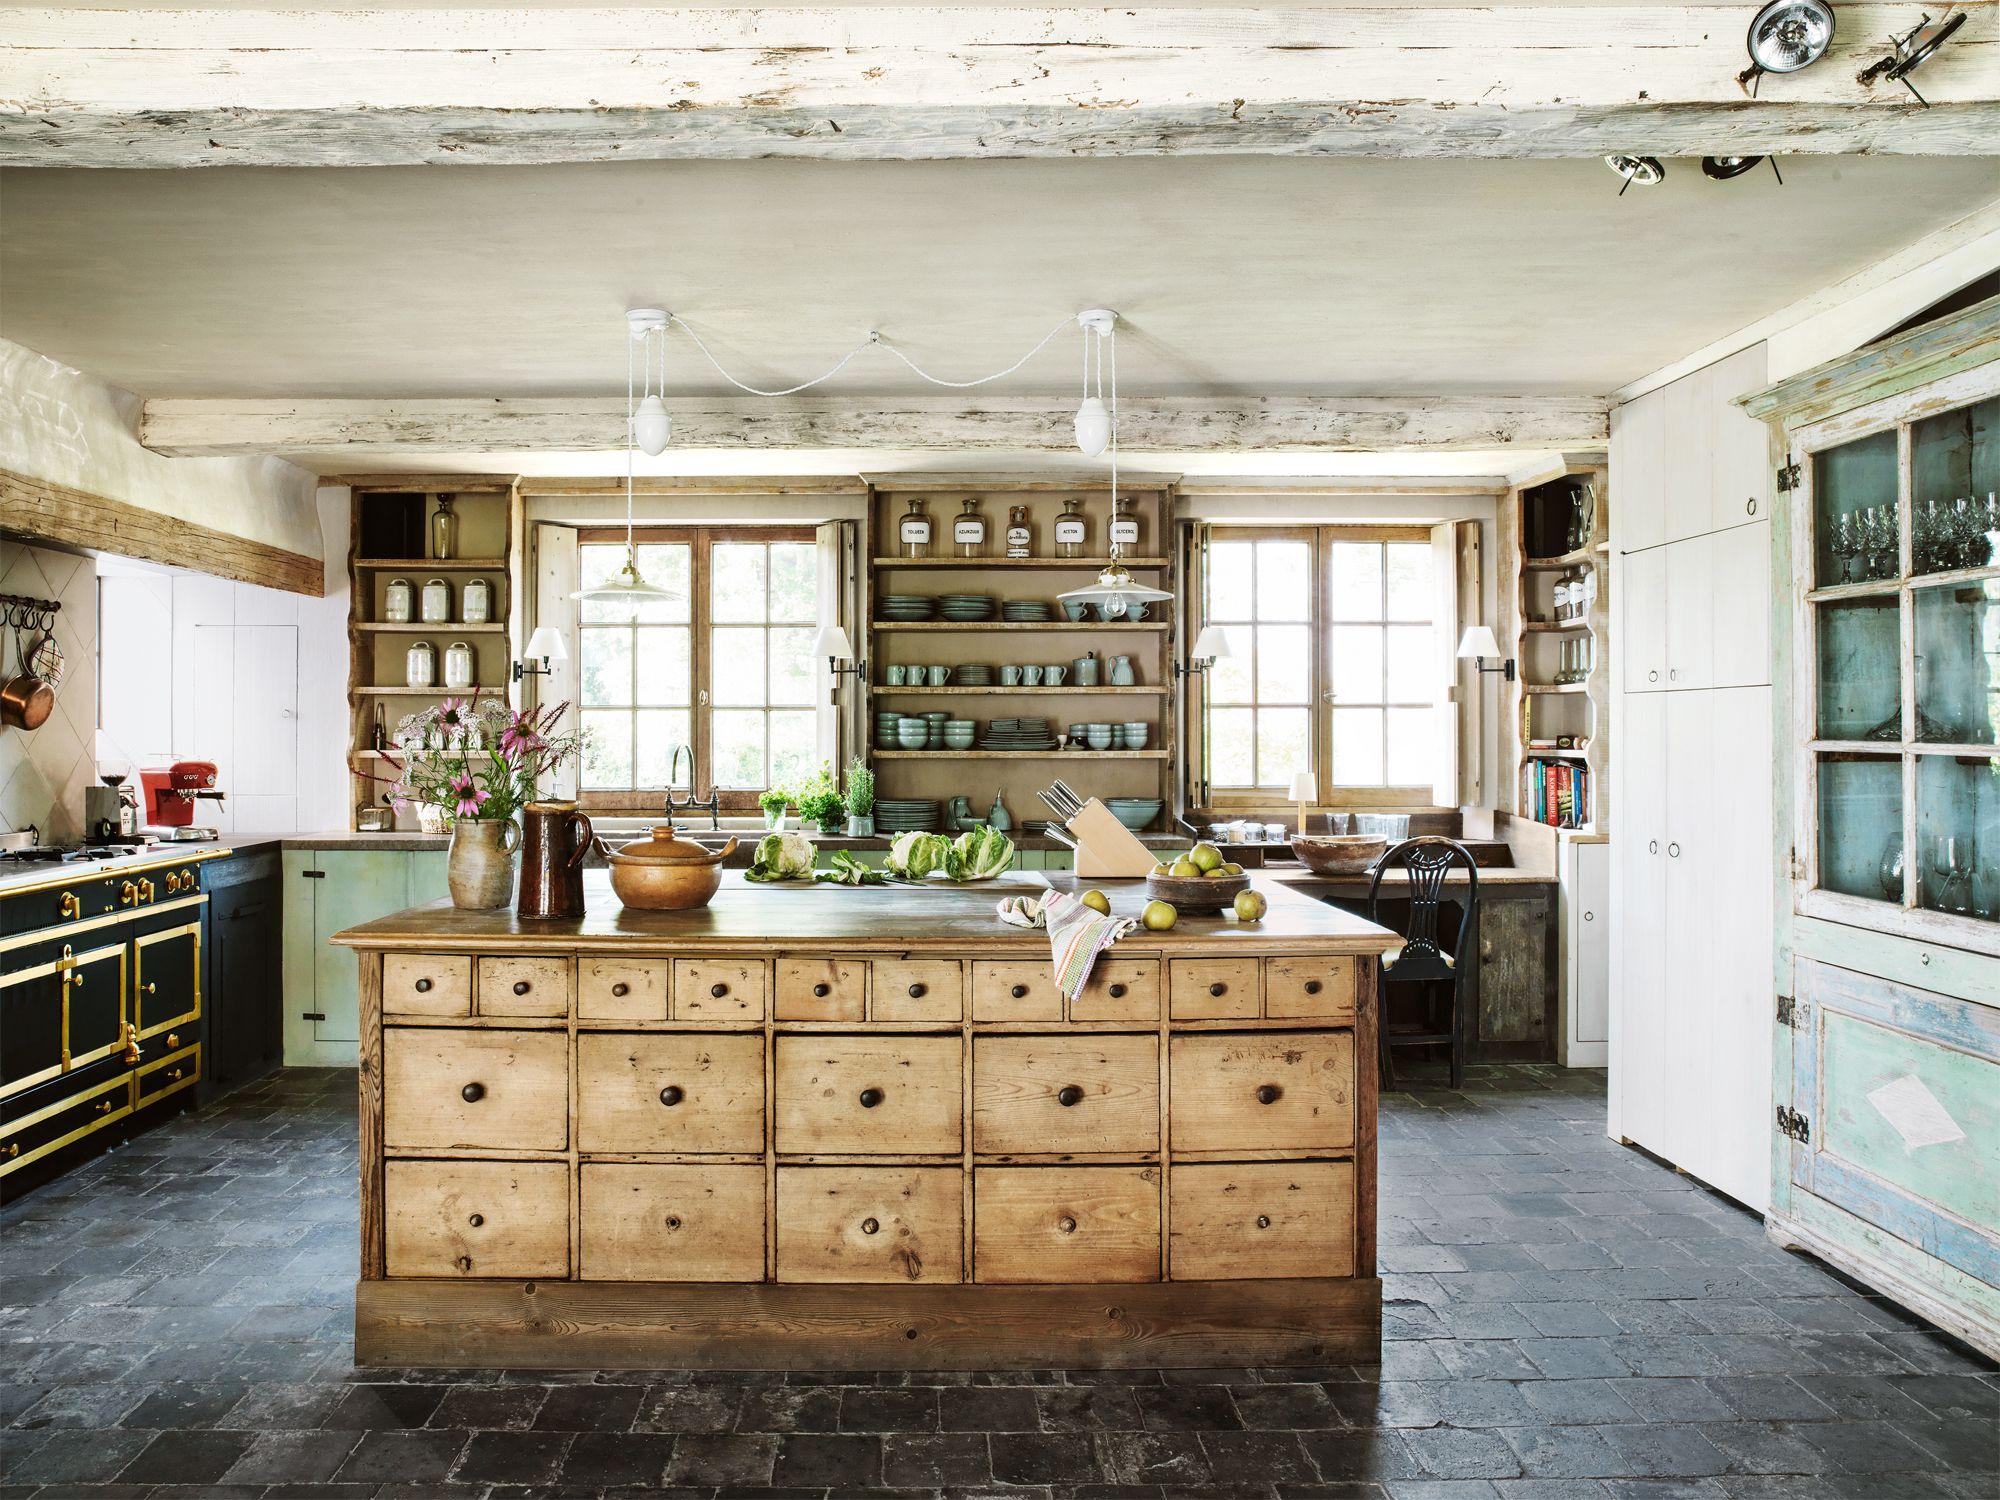 34 Farmhouse Style Kitchens - Rustic Decor Ideas for Kitchens on Farmhouse Rustic Kitchen Ideas  id=71702